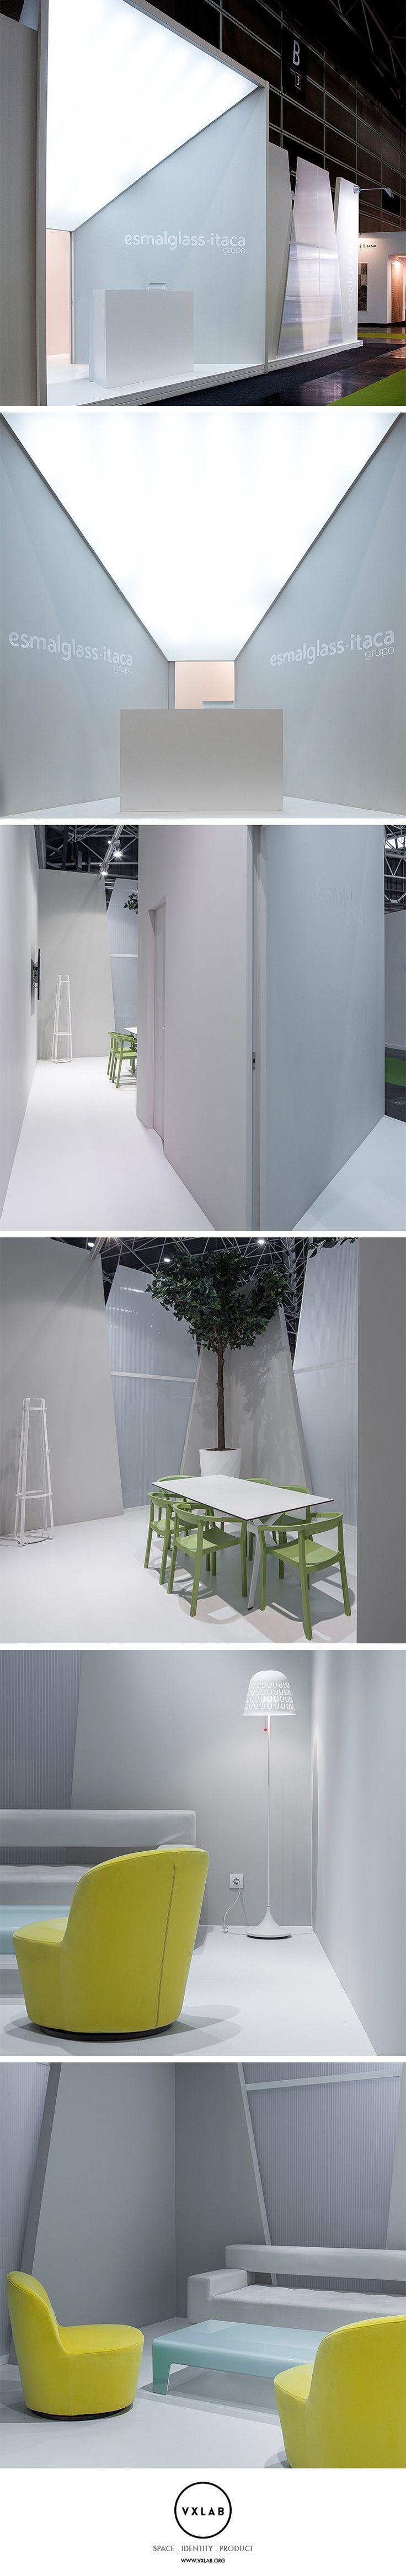 Esmalglass - Itaca Group at Cevisama Ceramic Tile Exhibition 2015. Design by VXLAB Branding & Design Management: www.vxlab.org